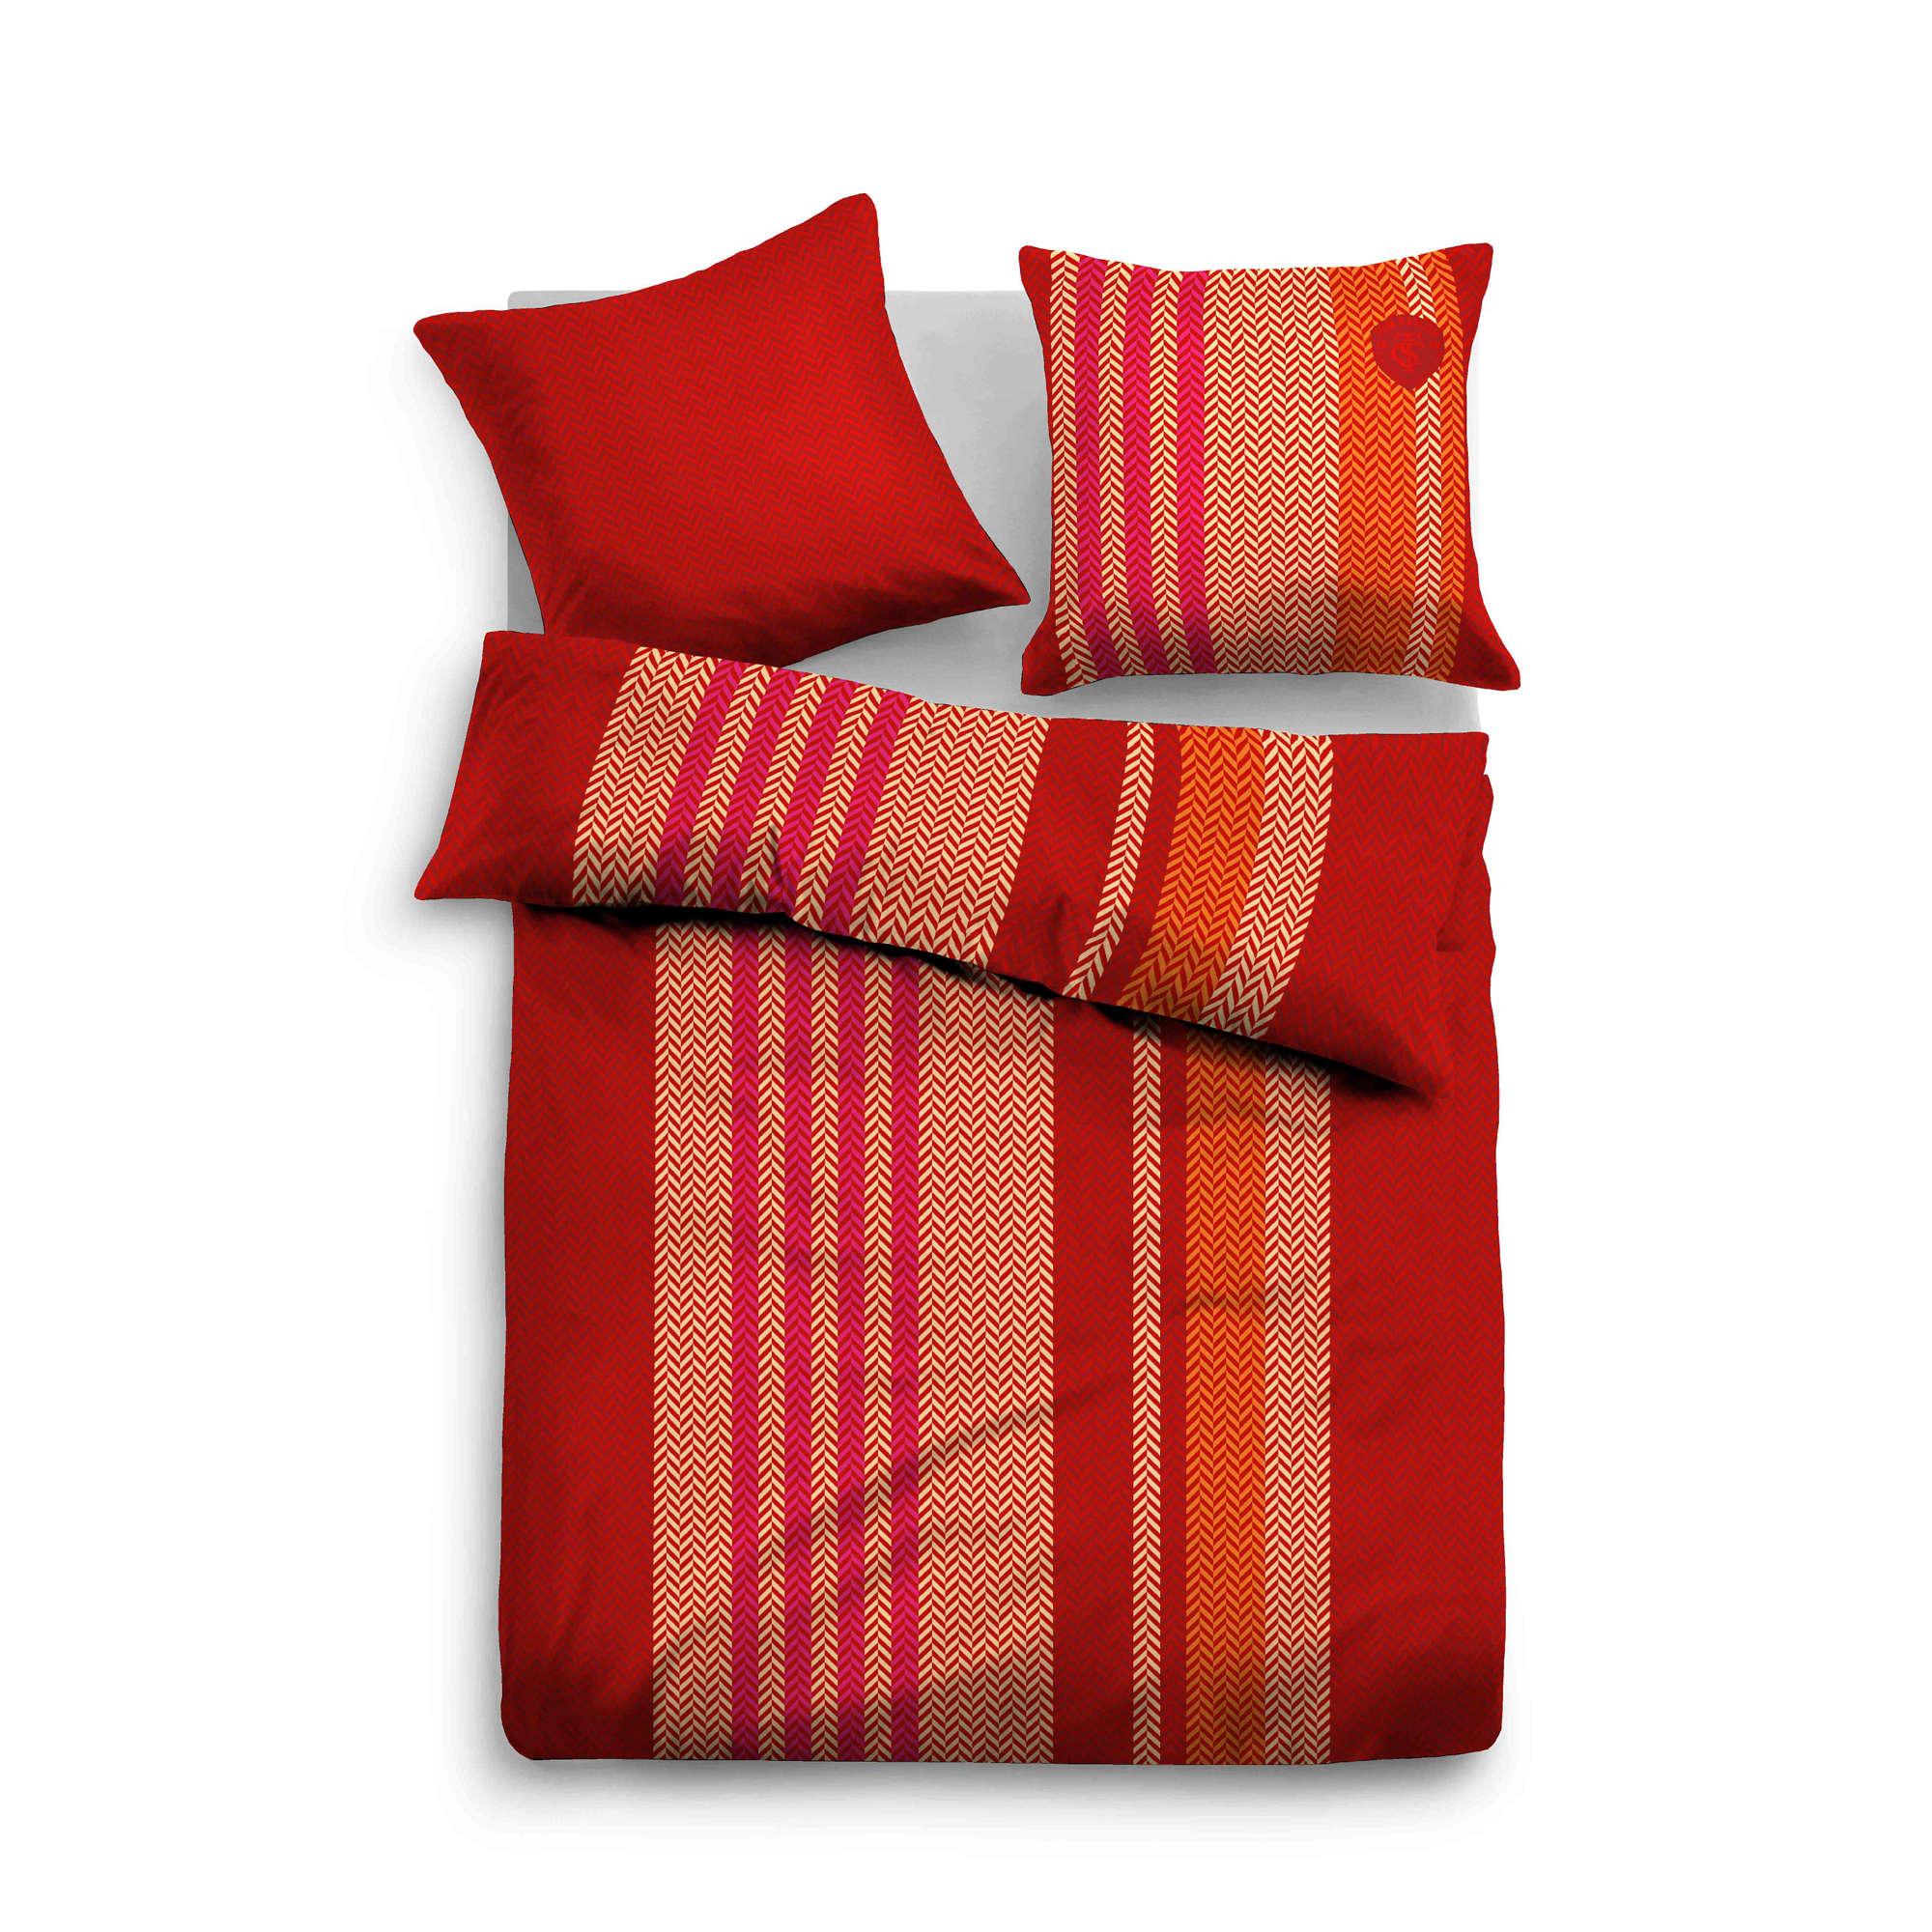 tom tailor bettw sche rot flanell. Black Bedroom Furniture Sets. Home Design Ideas